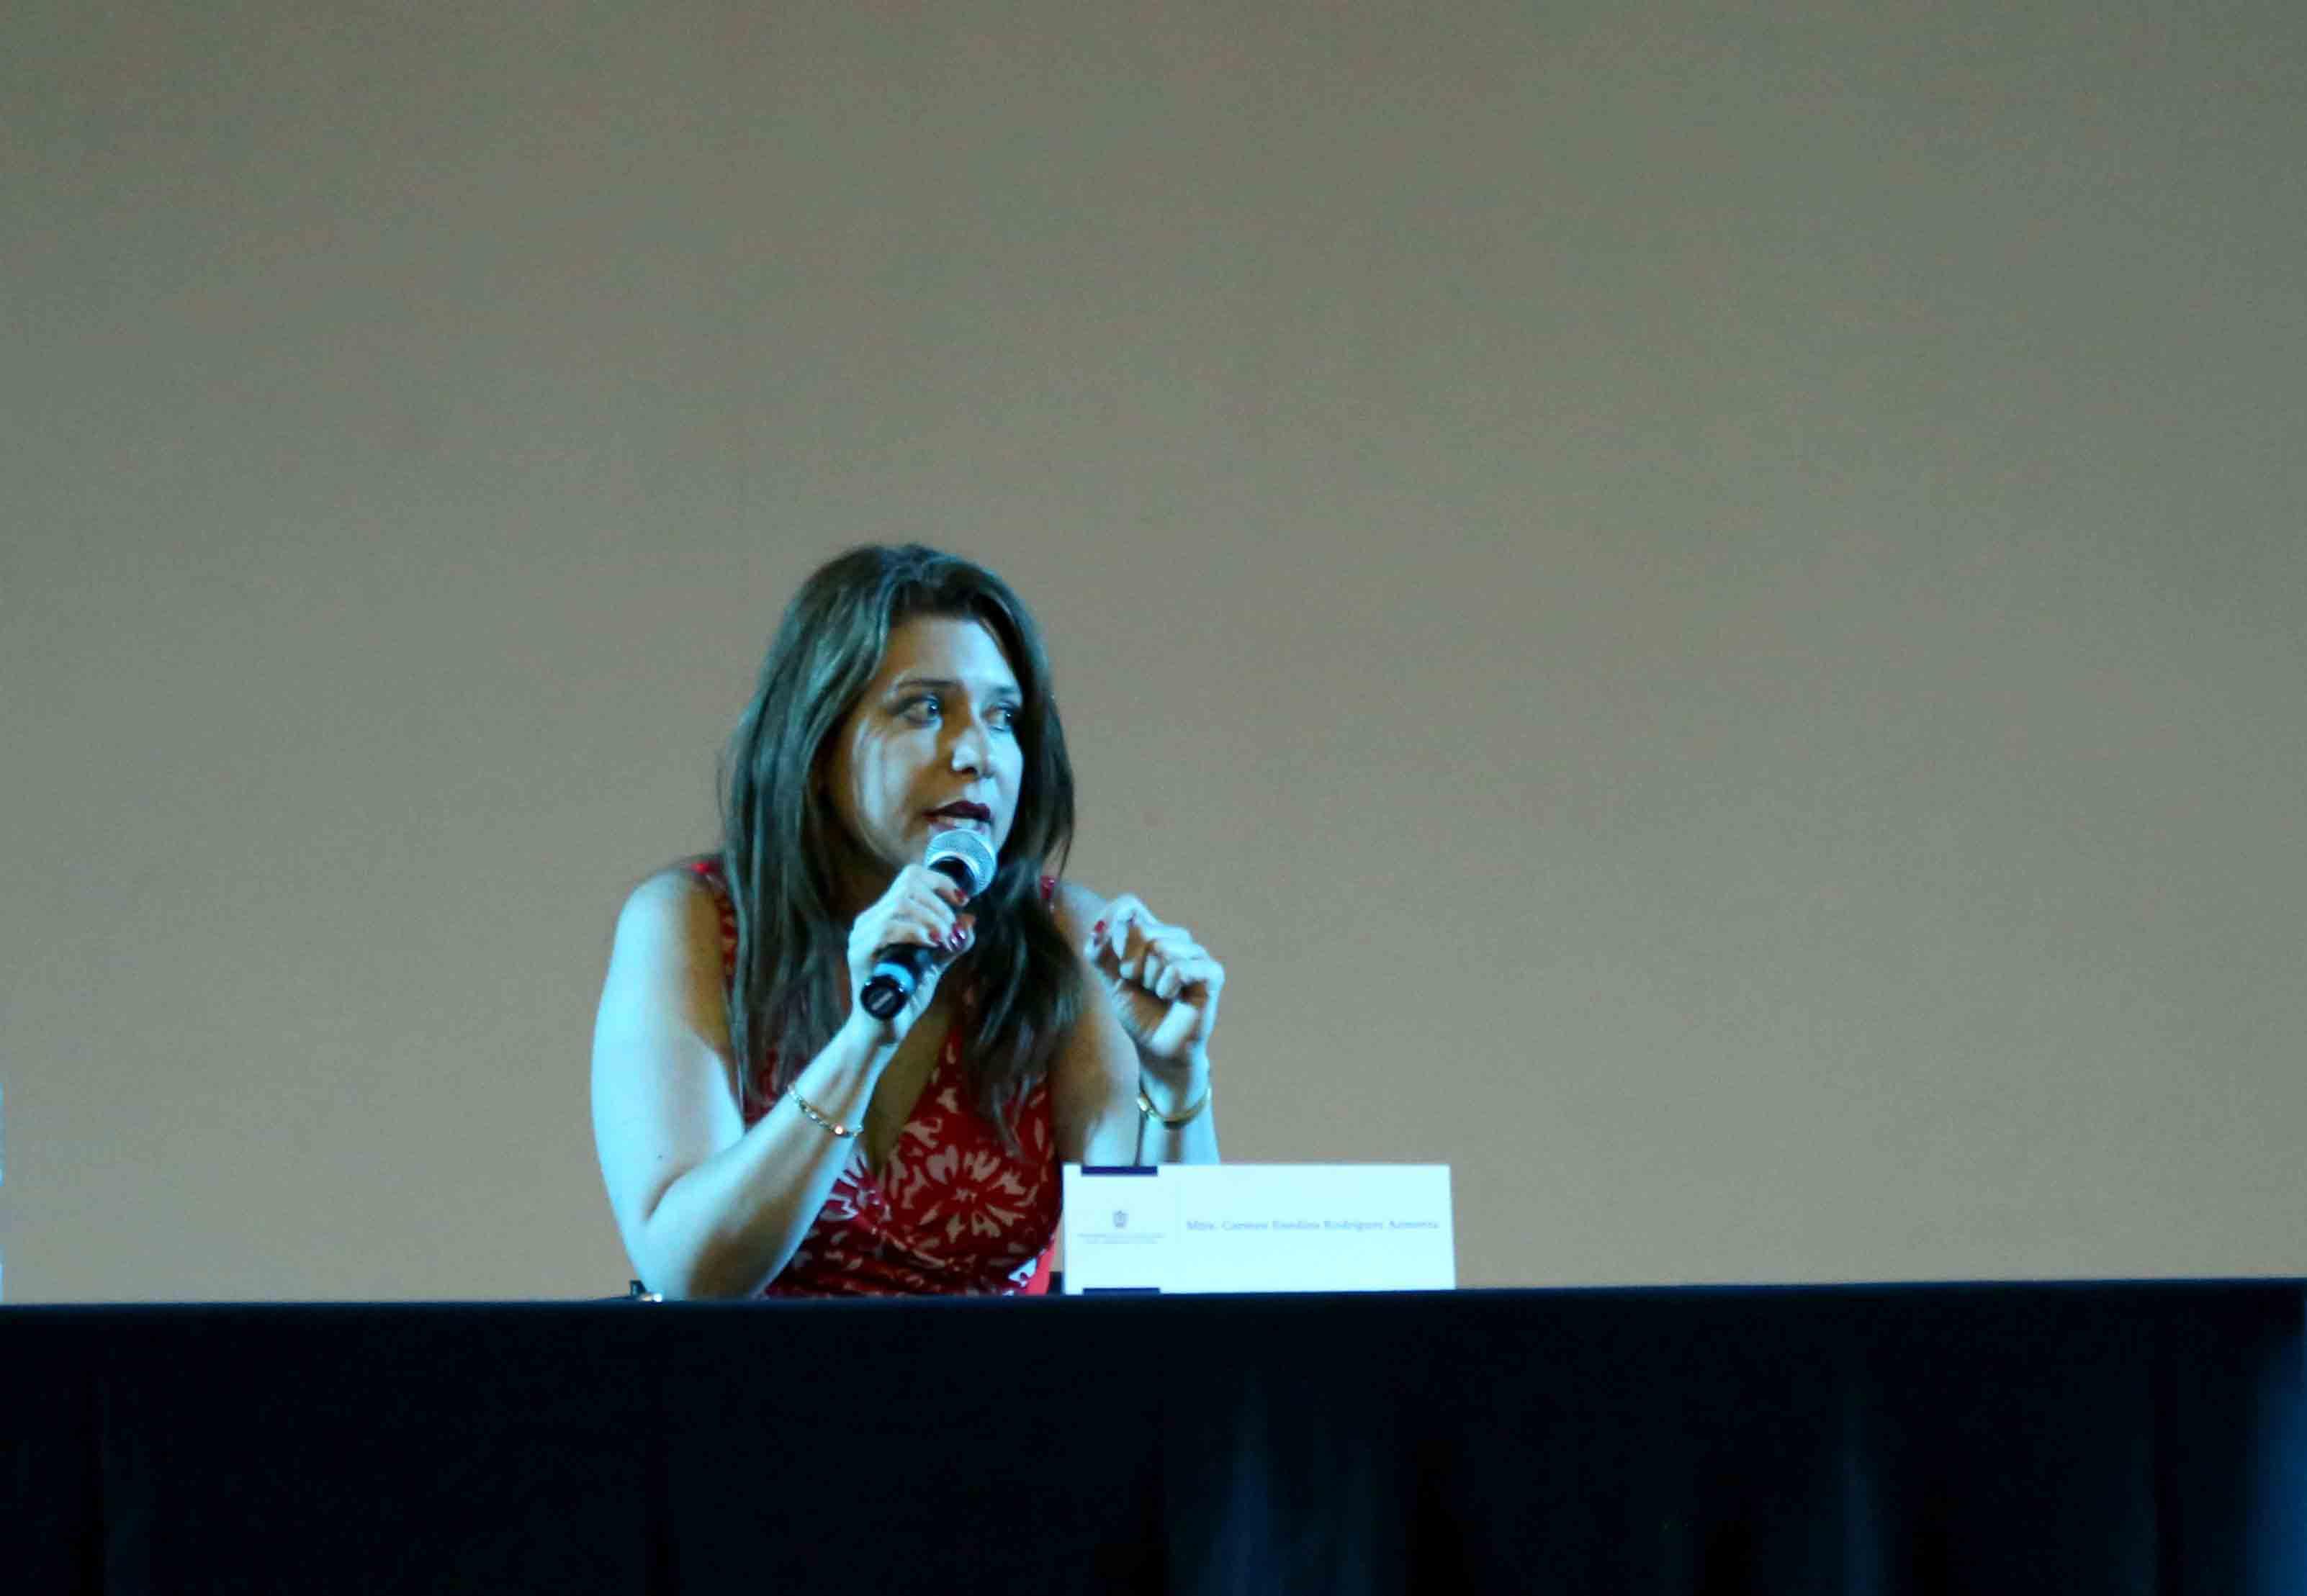 Mtra. Carmen Rodríguez Armenta, hablando frente al microfono